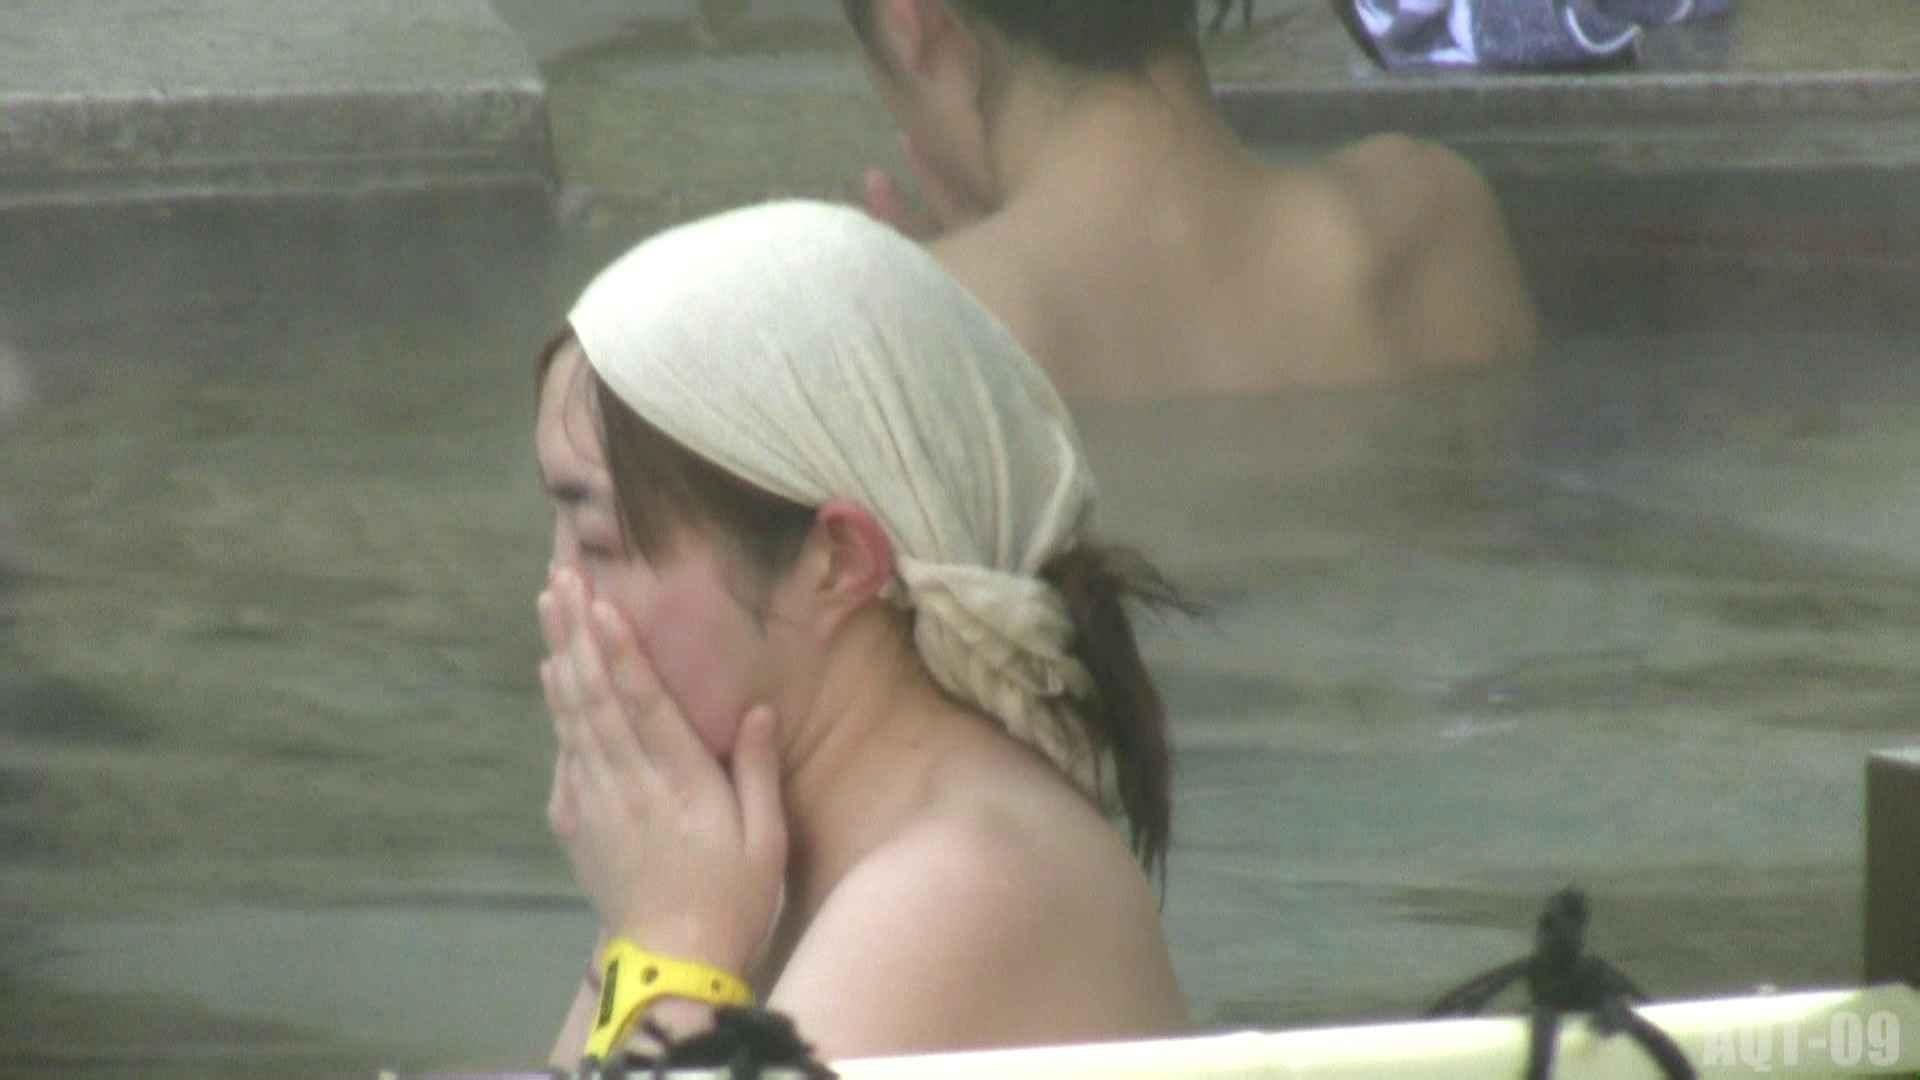 Aquaな露天風呂Vol.781 露天風呂   OLのエロ生活  93連発 19